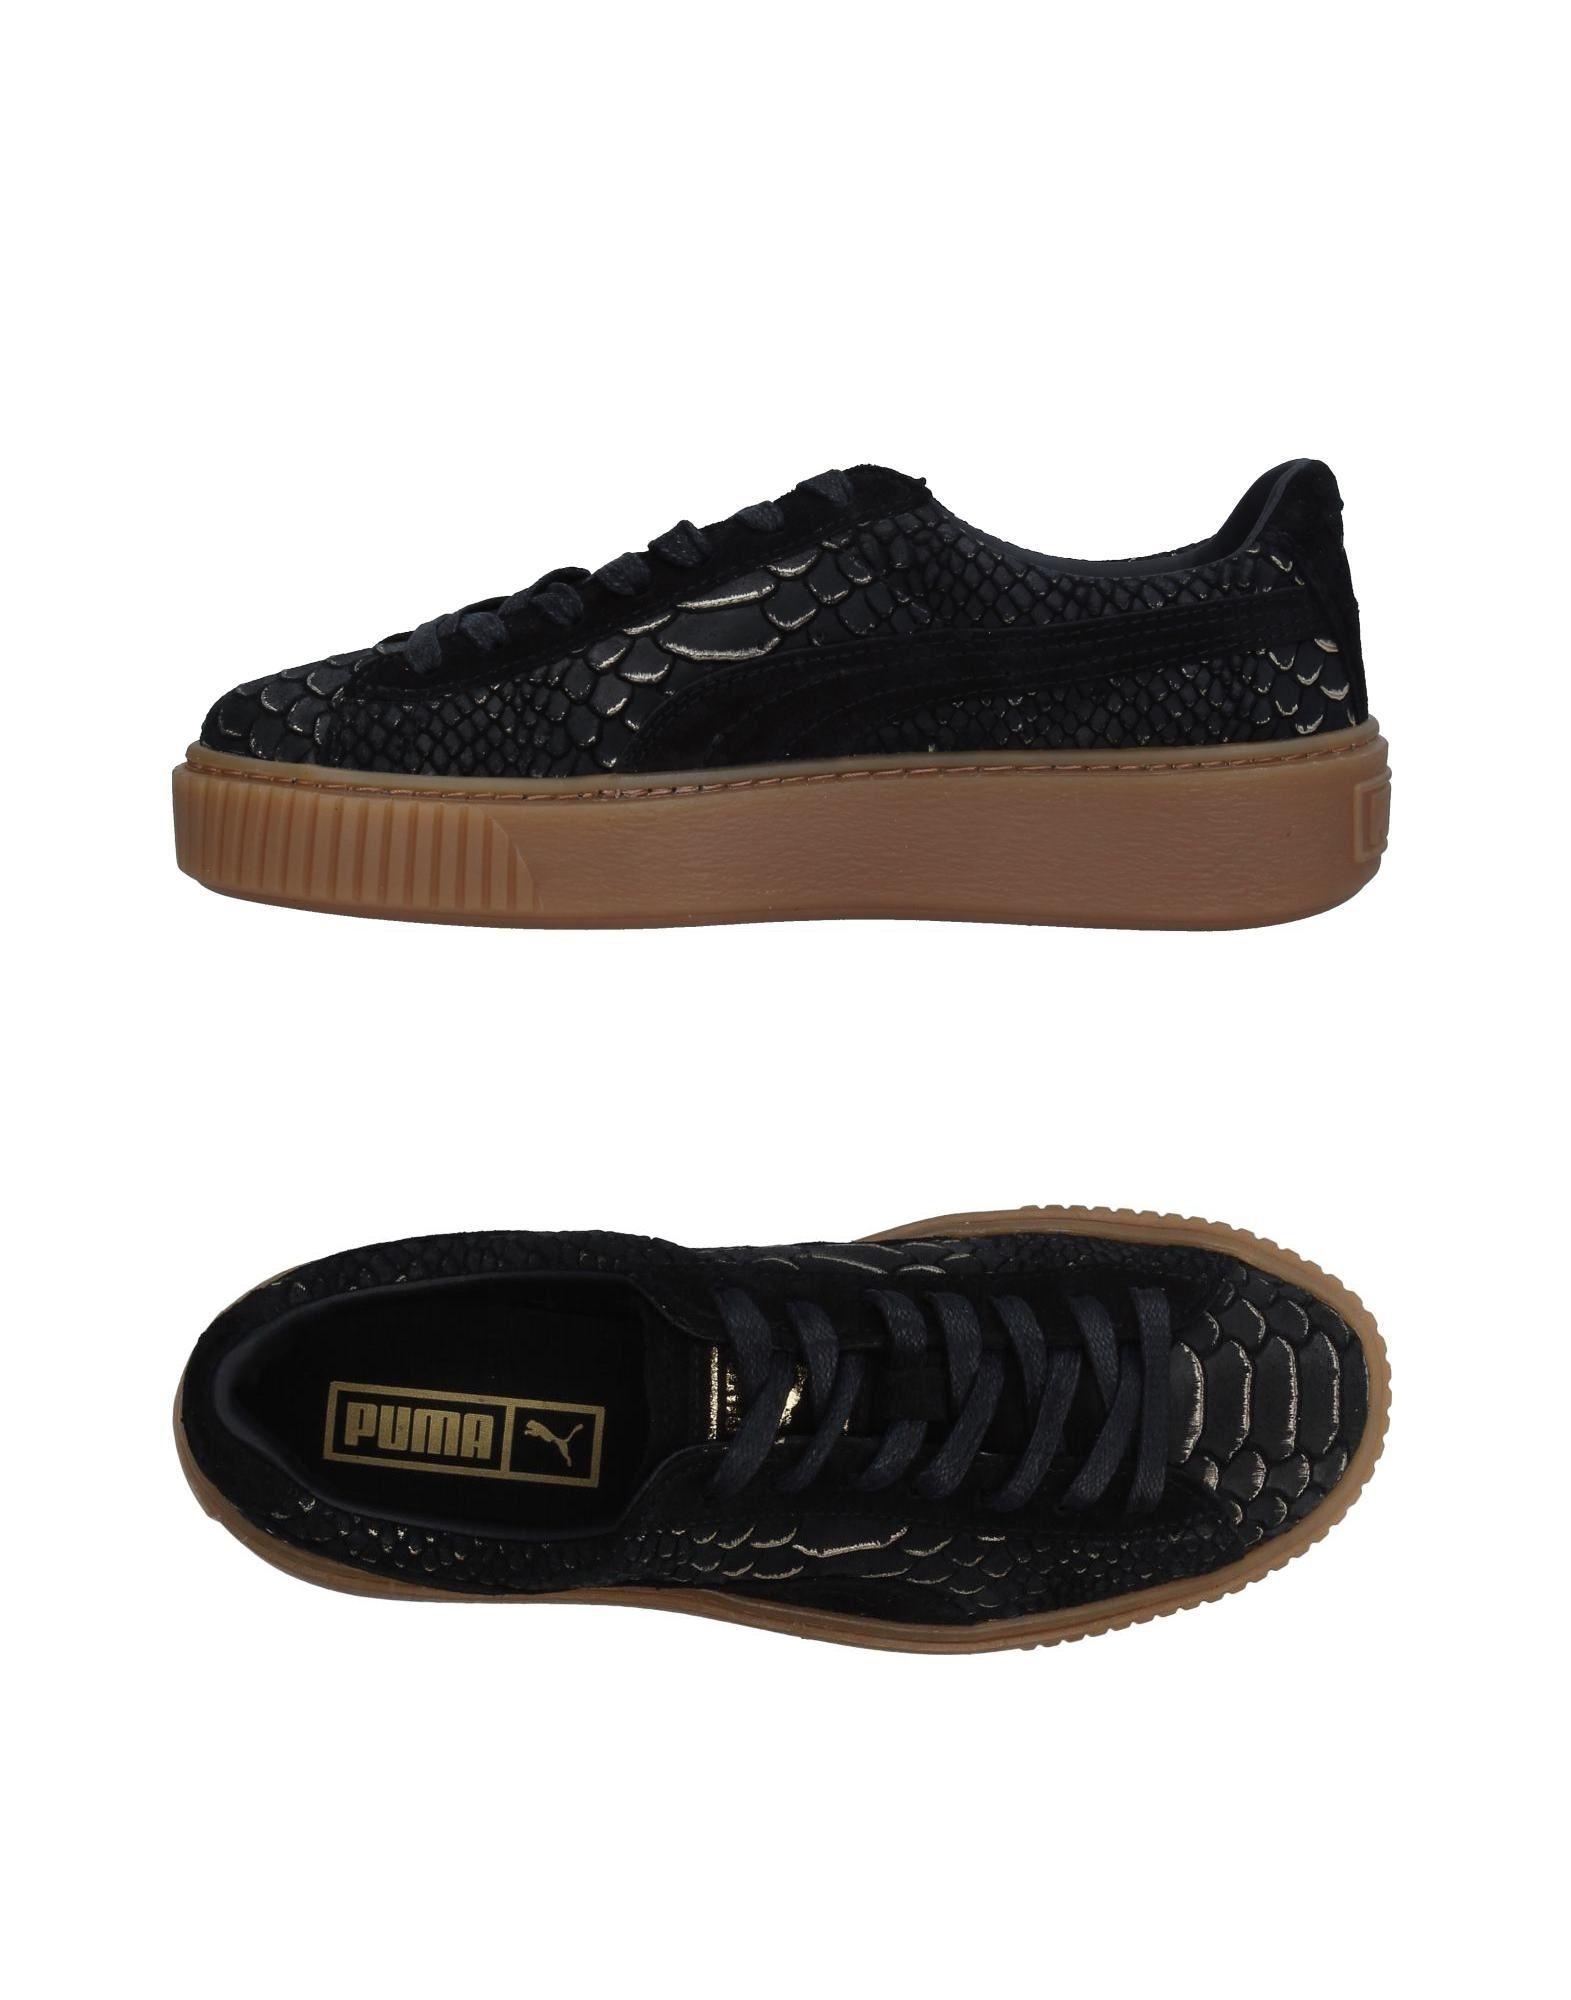 Haltbare Mode billige Schuhe Puma Sneakers Damen  11326451PB Heiße Schuhe